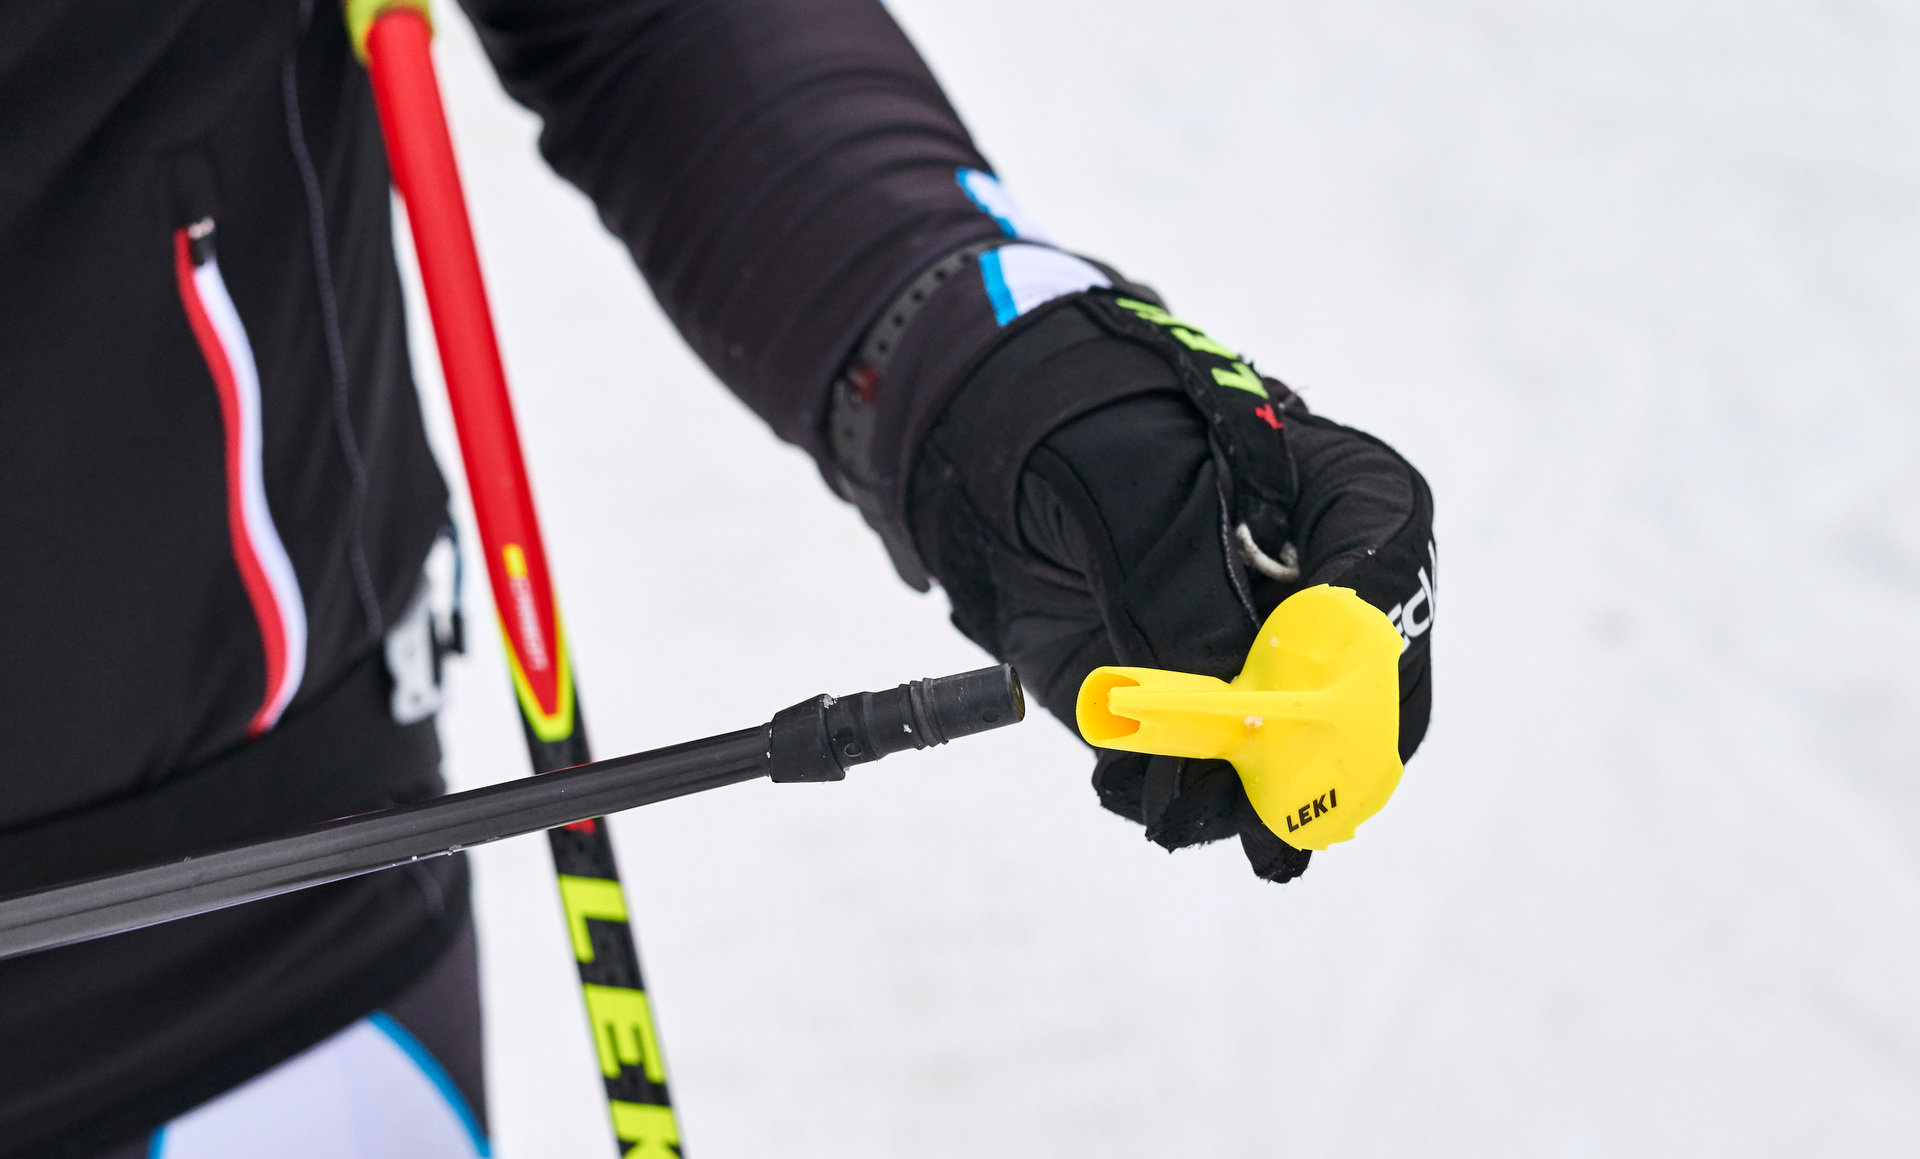 Leki Fin Vario winterteller st/öcke NEU